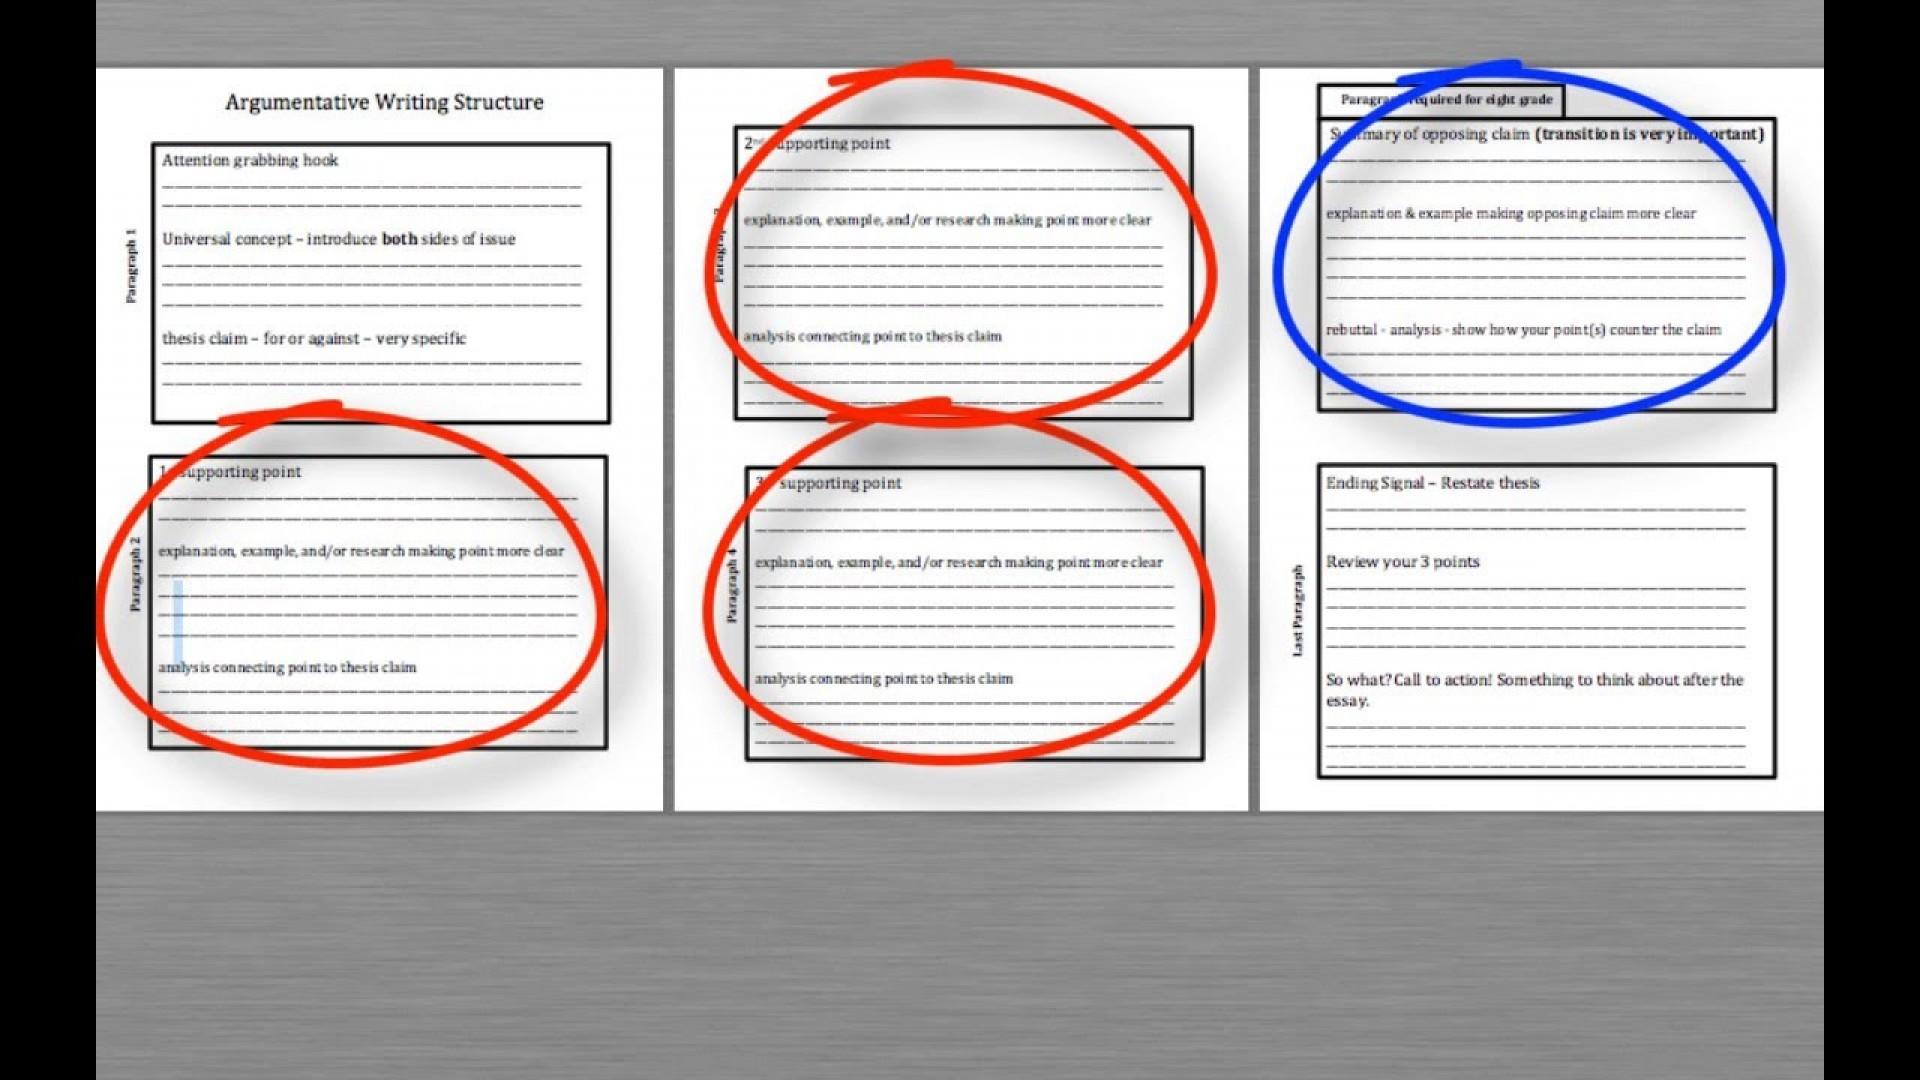 019 Argumentative Essay Structure Example Imposing Ppt Pdf Outline Worksheet 1920